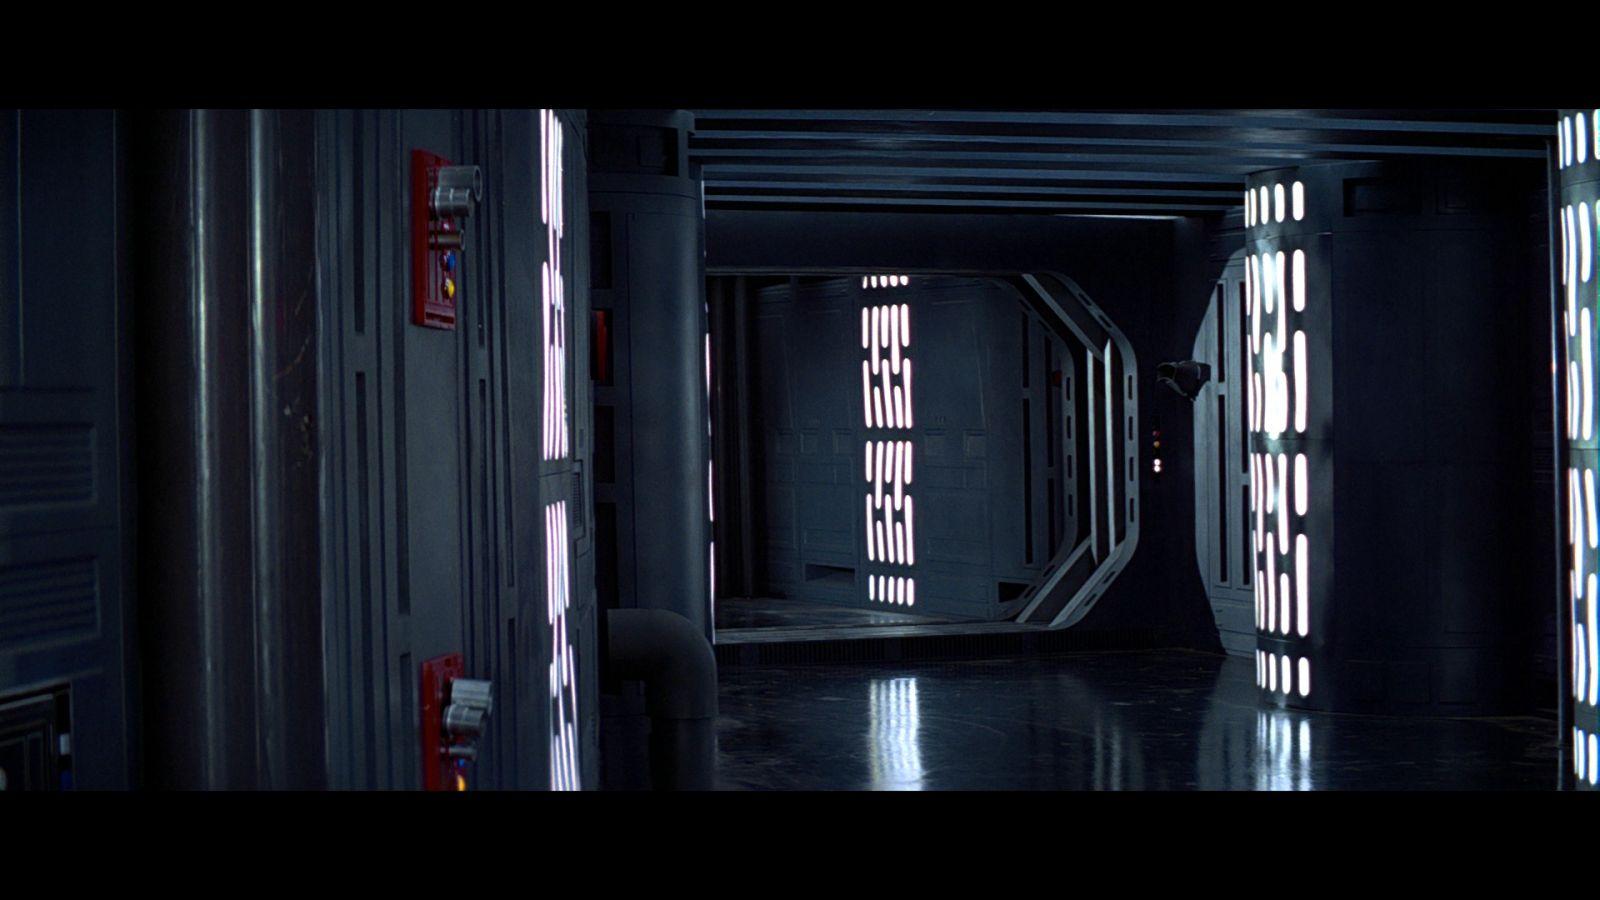 Star Wars A New Hope Bluray Capture 03-21.jpg